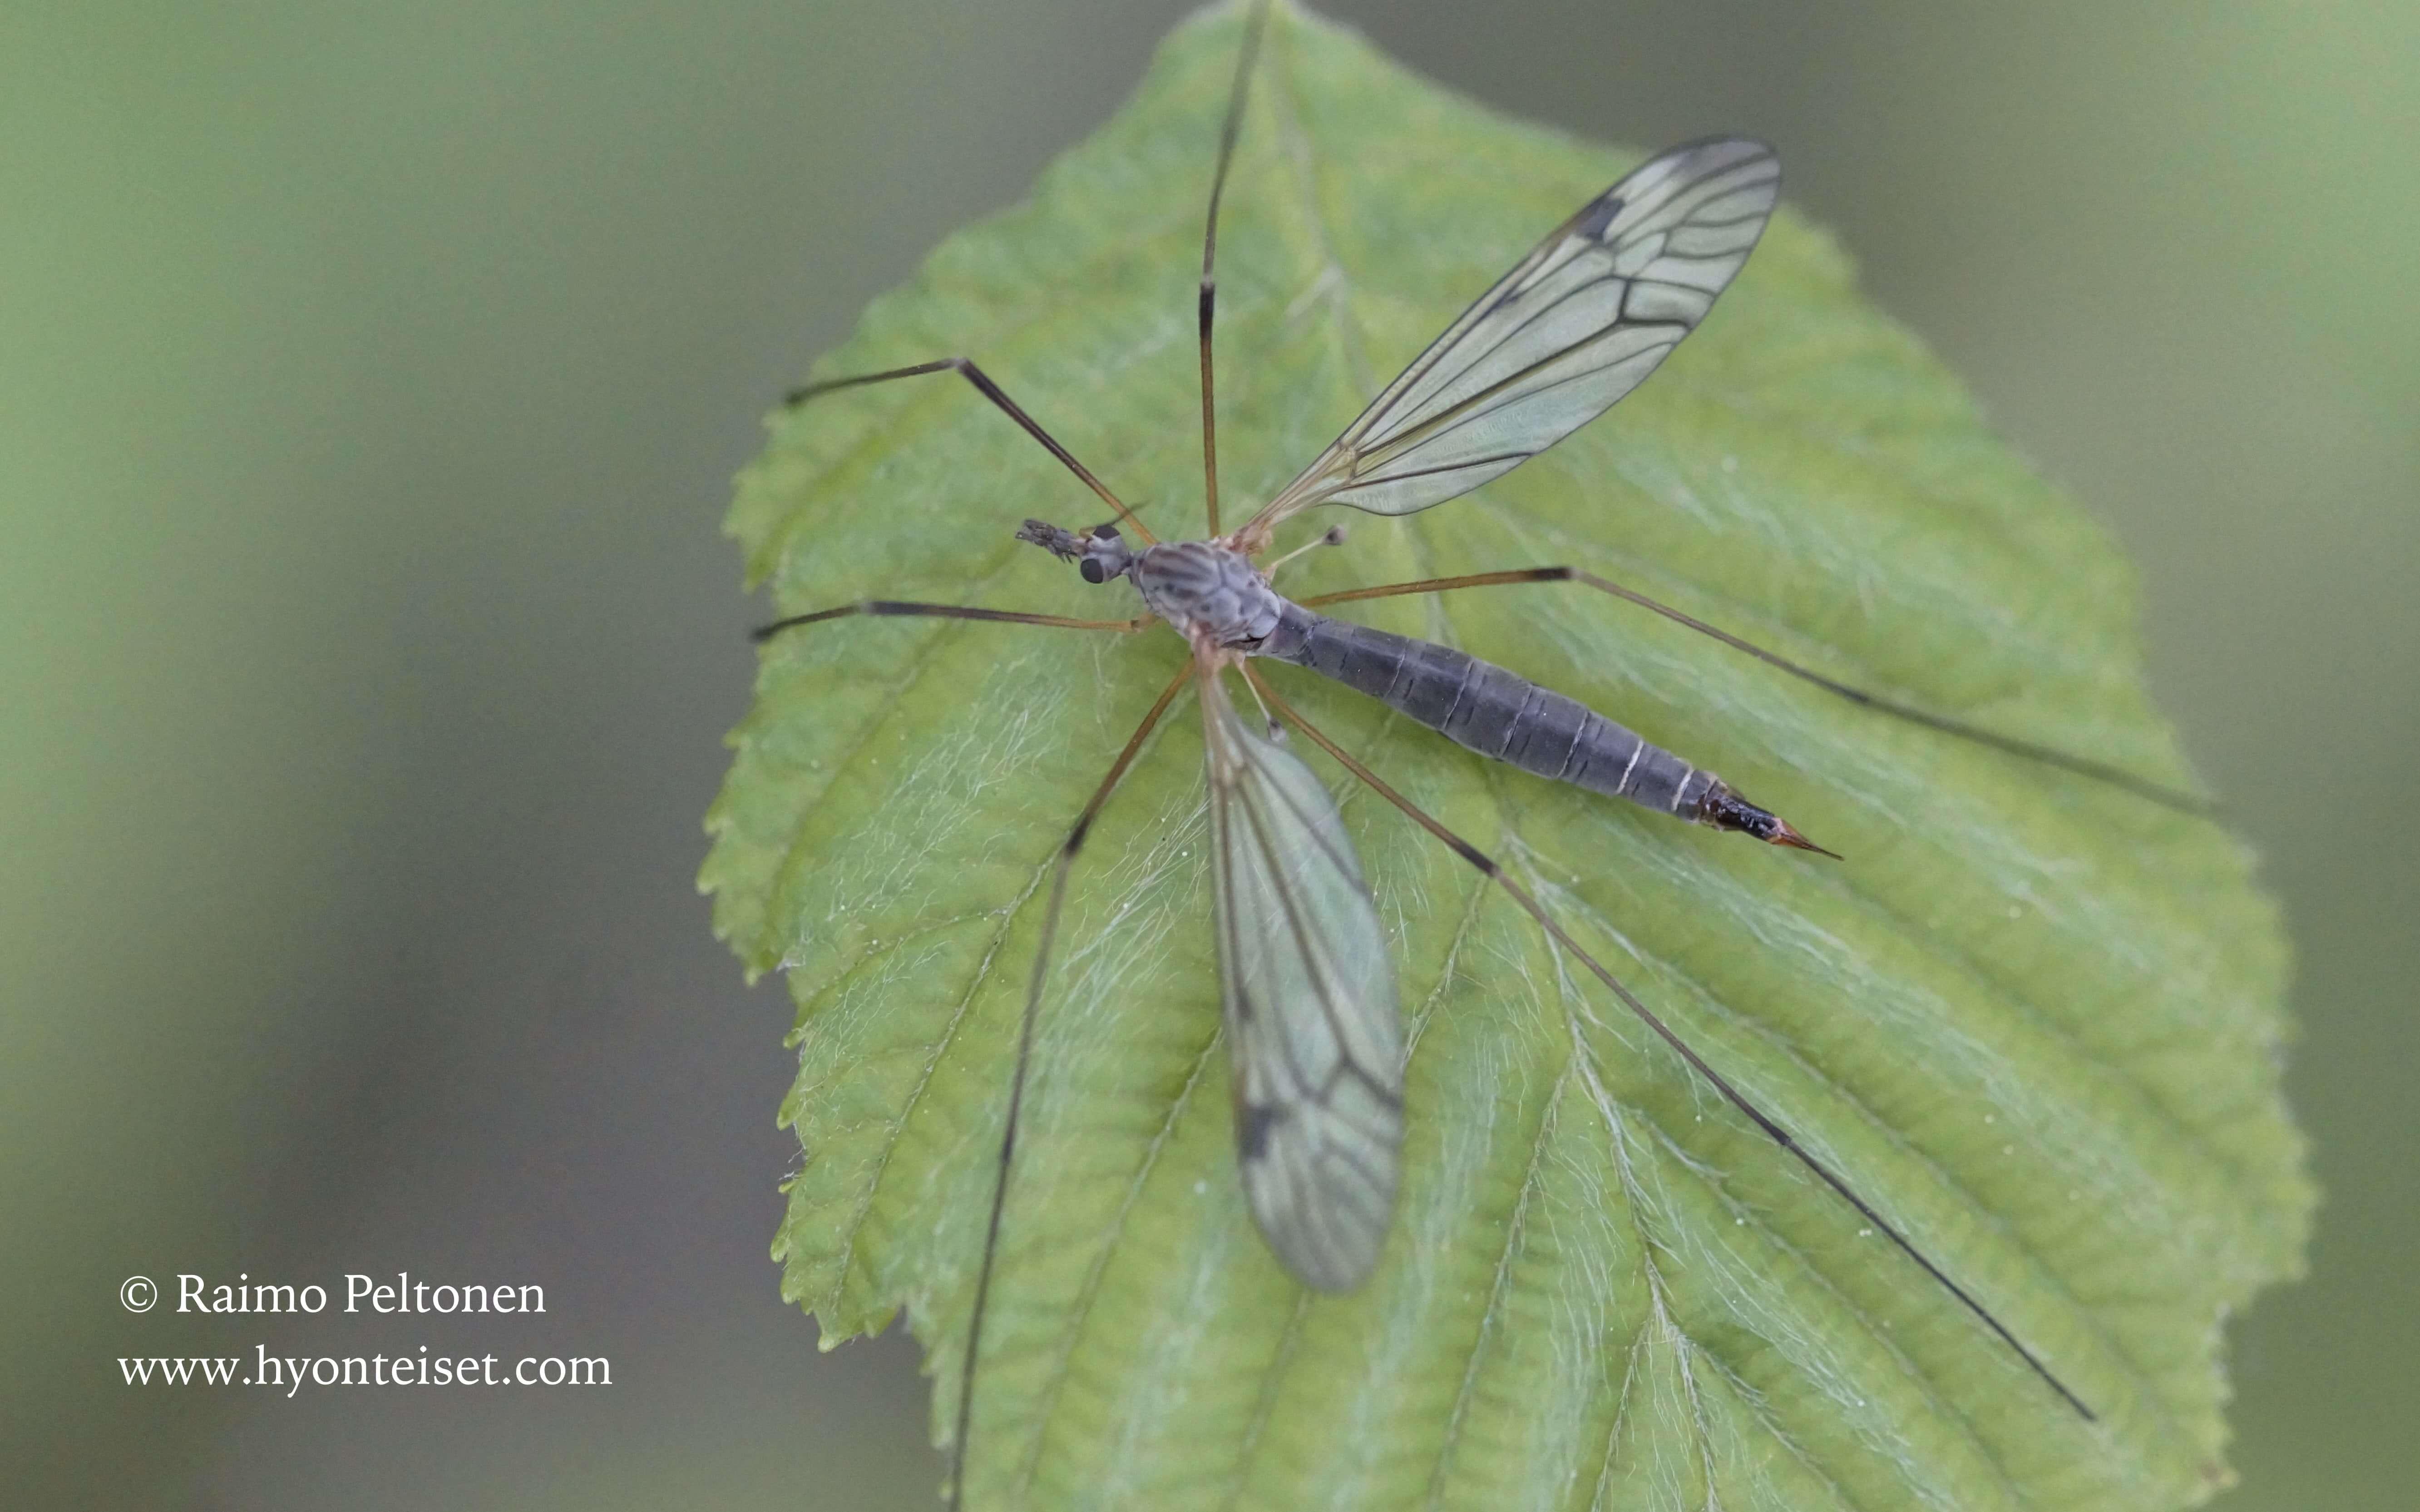 Tipula sp. sg. Pterelachisus (det. Esko Viitanen), 30.5.2015 Jyväskylä